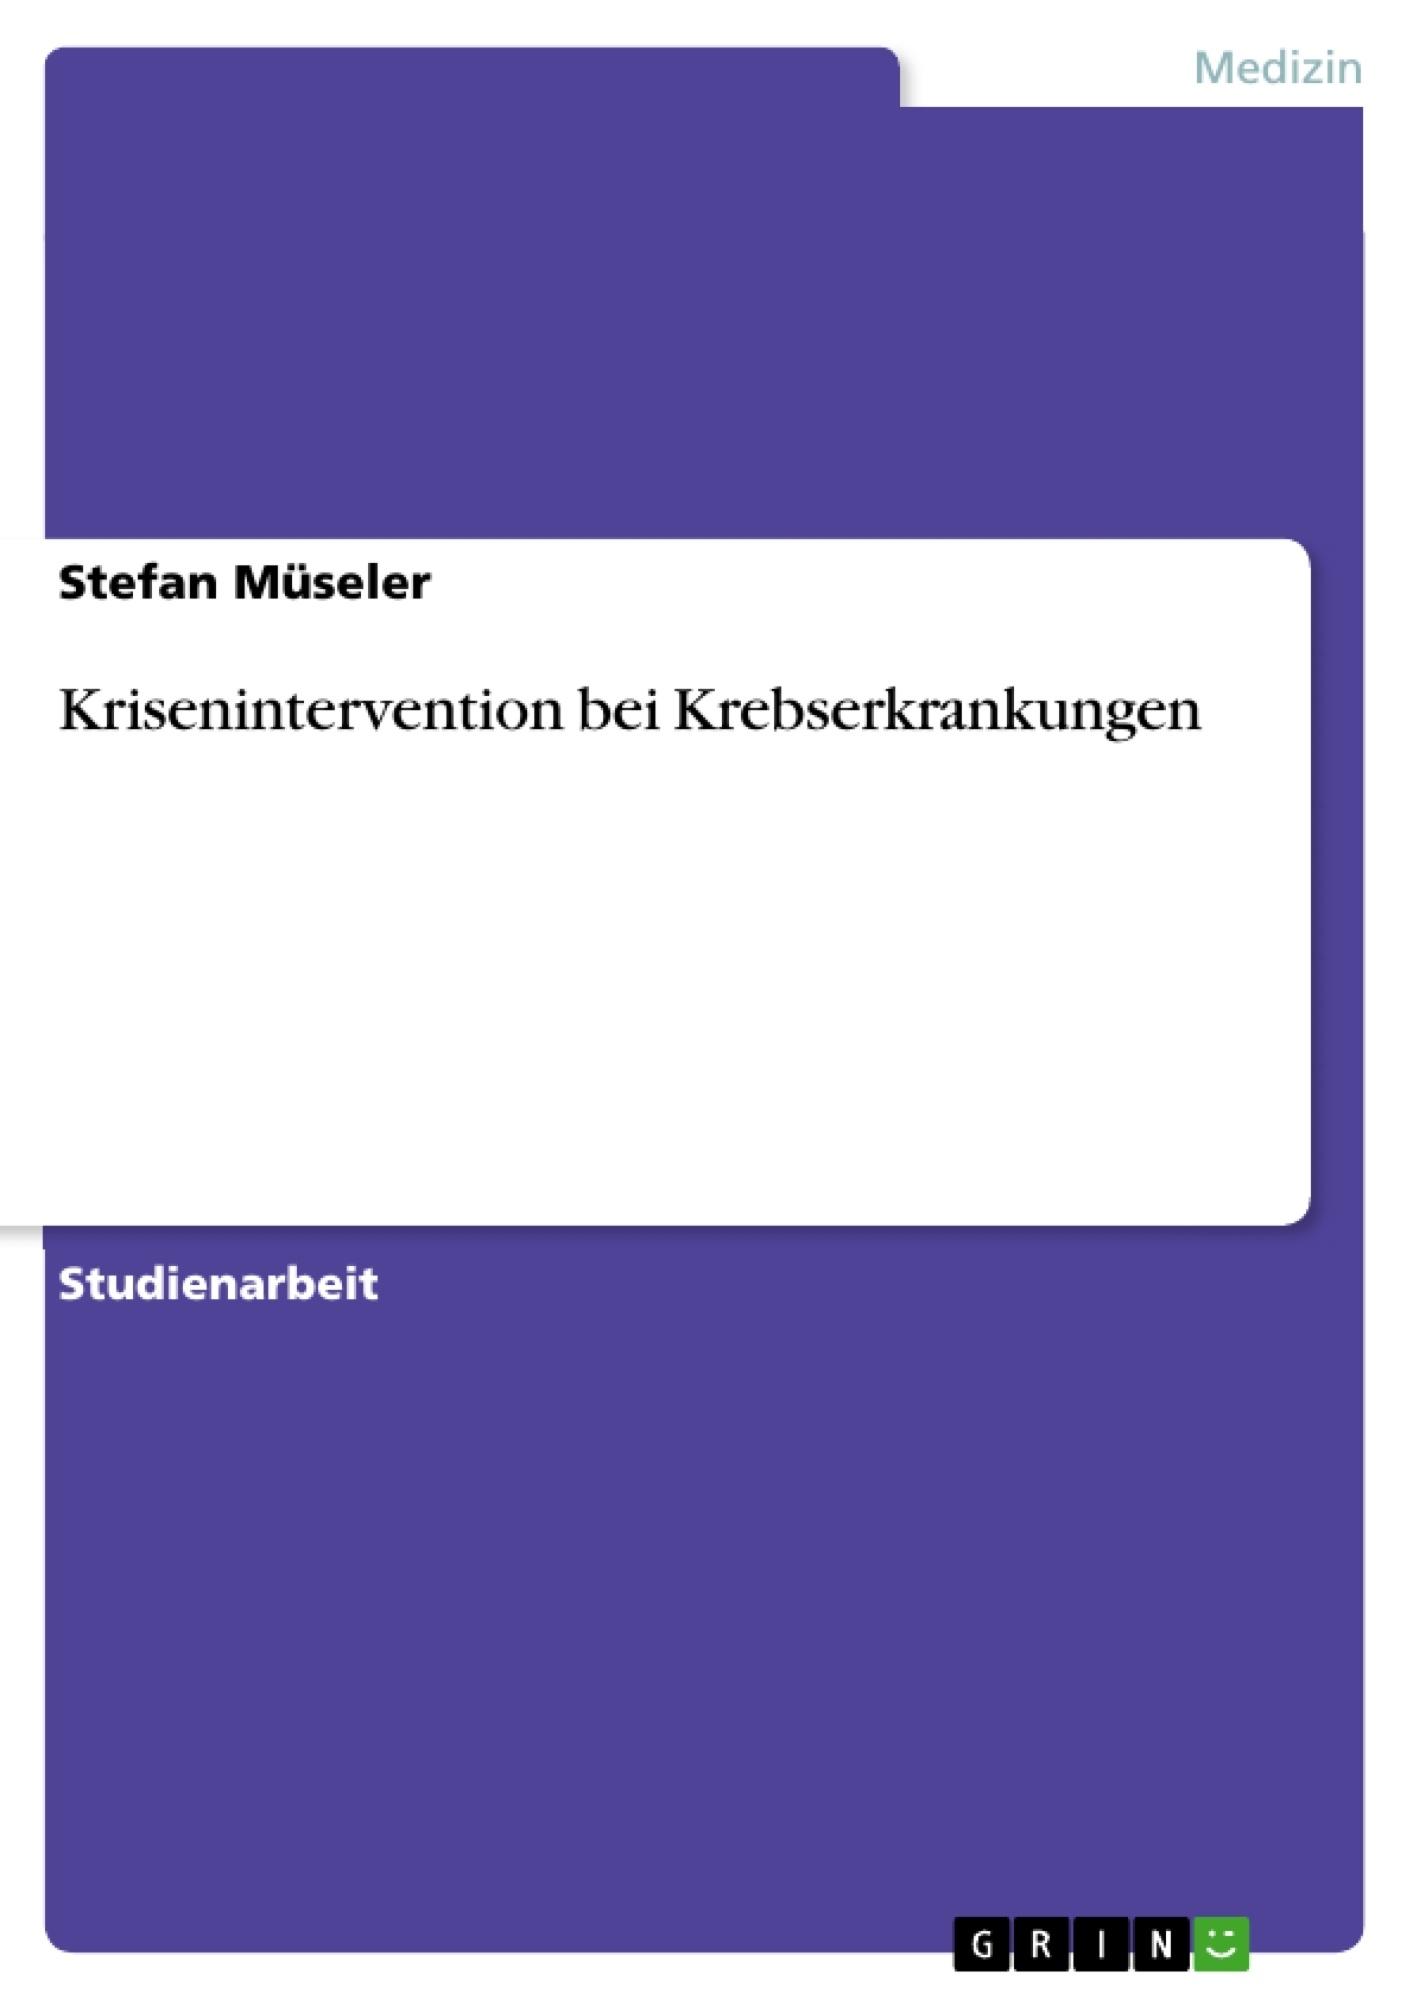 Titel: Krisenintervention bei Krebserkrankungen